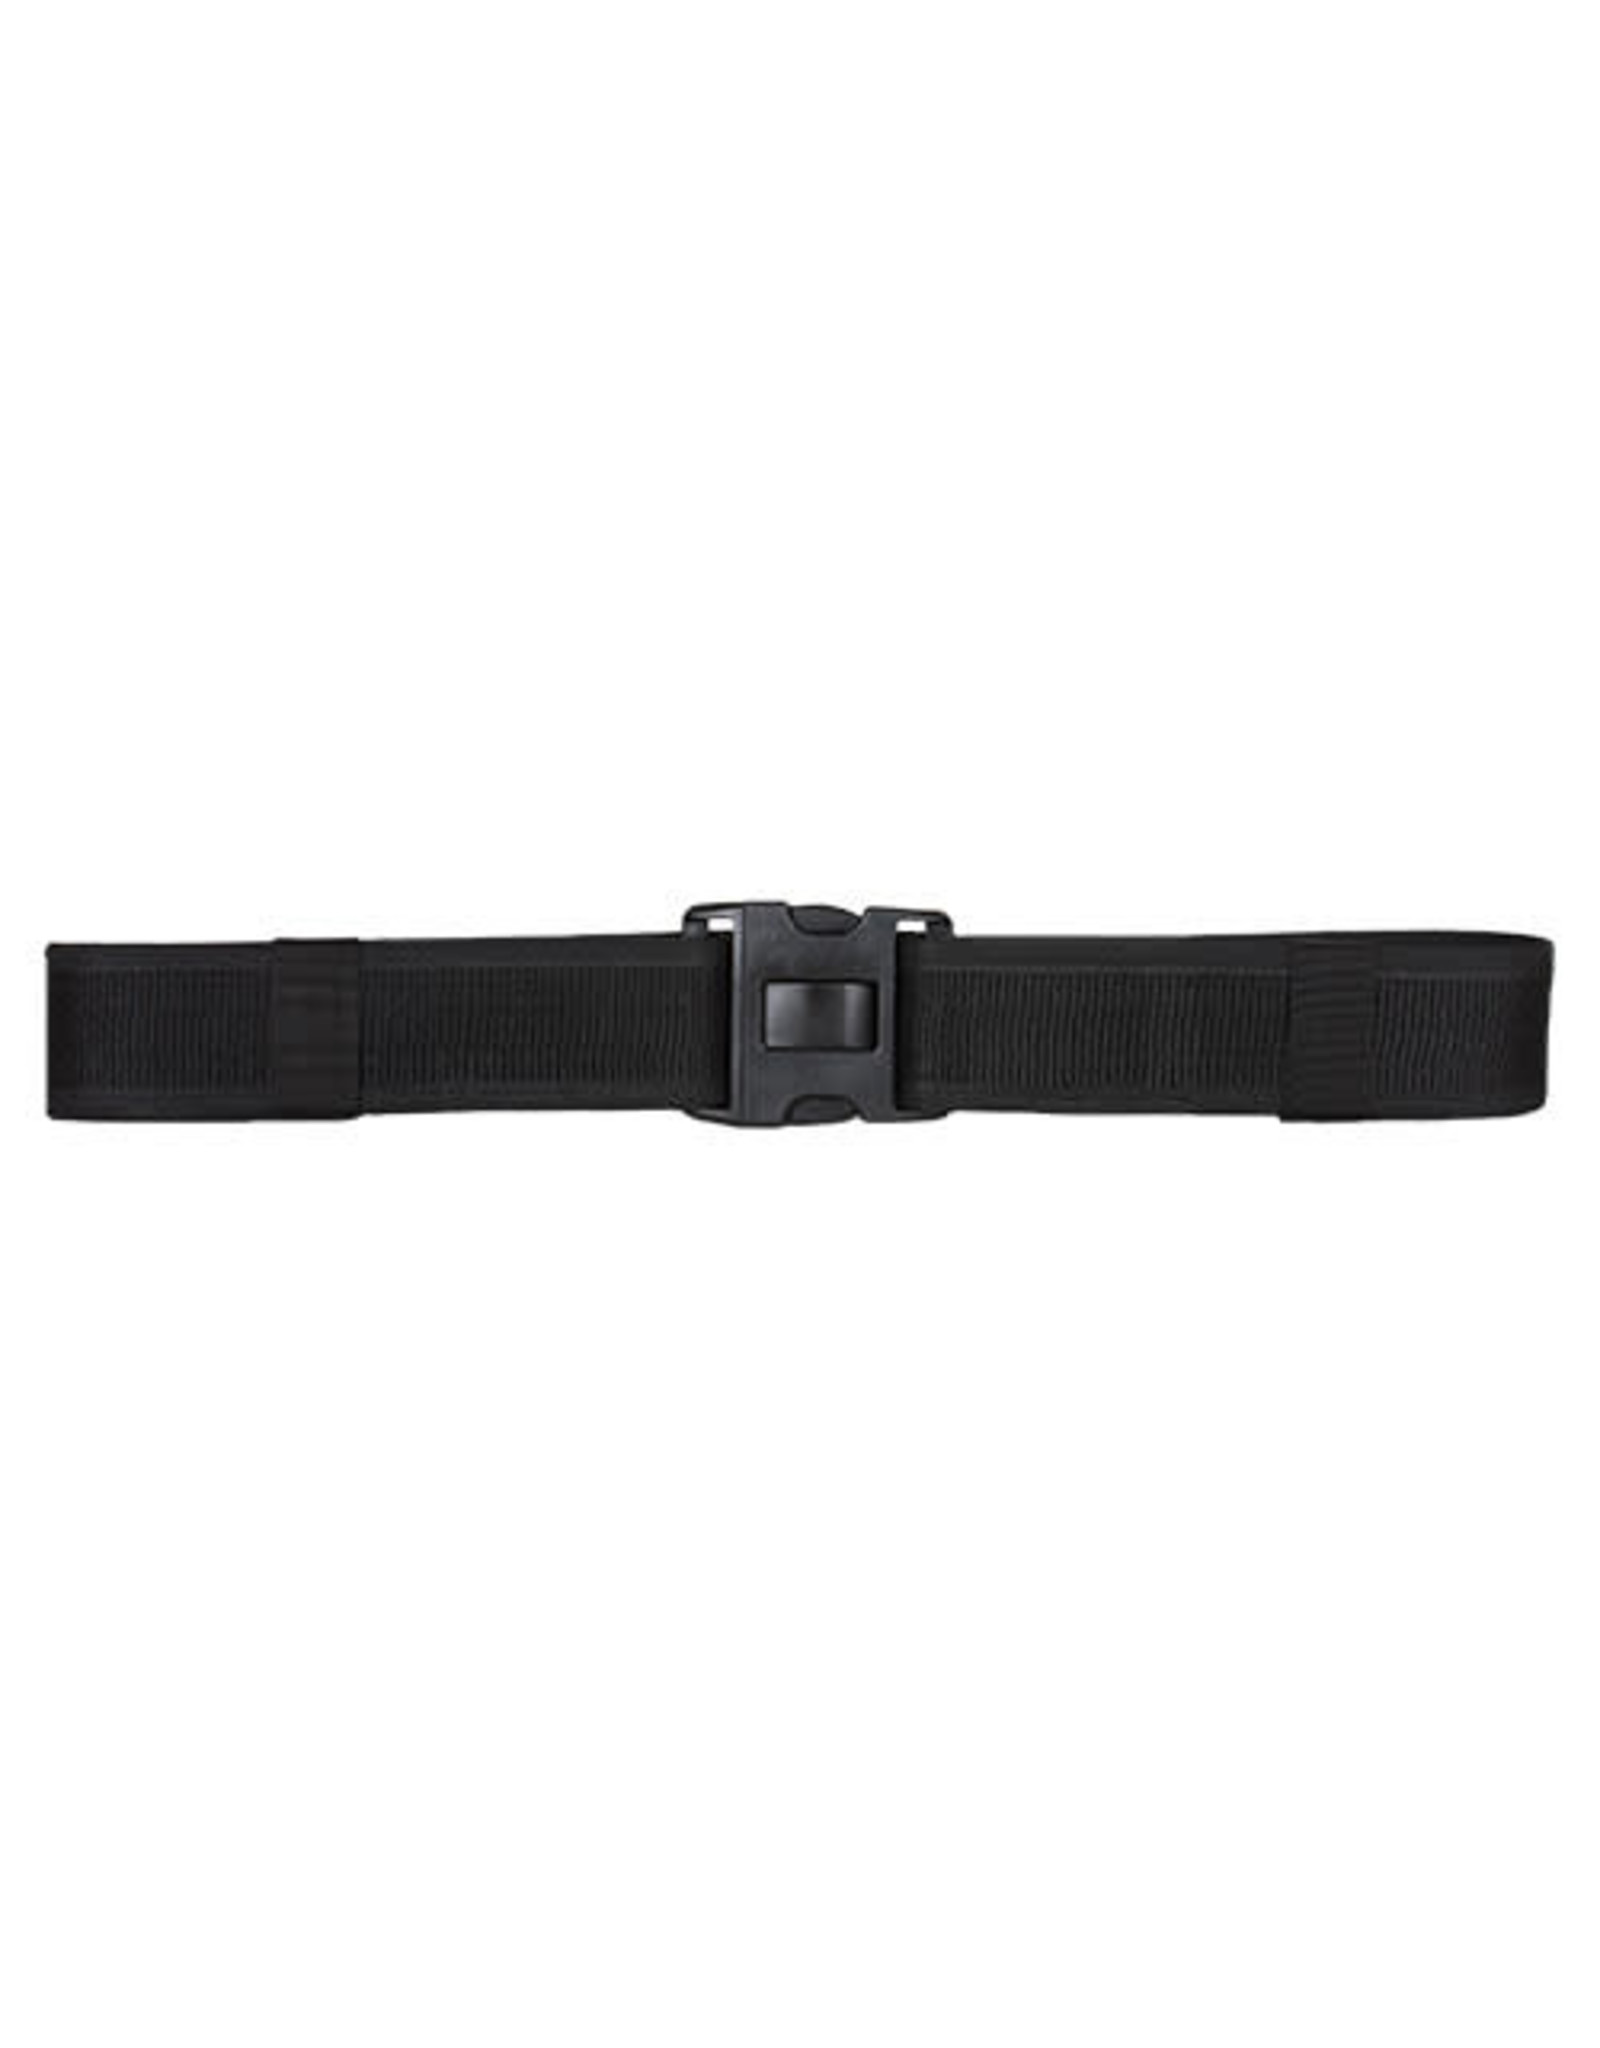 "Fox Outdoor Products Duty Belt - 2"" Wide"